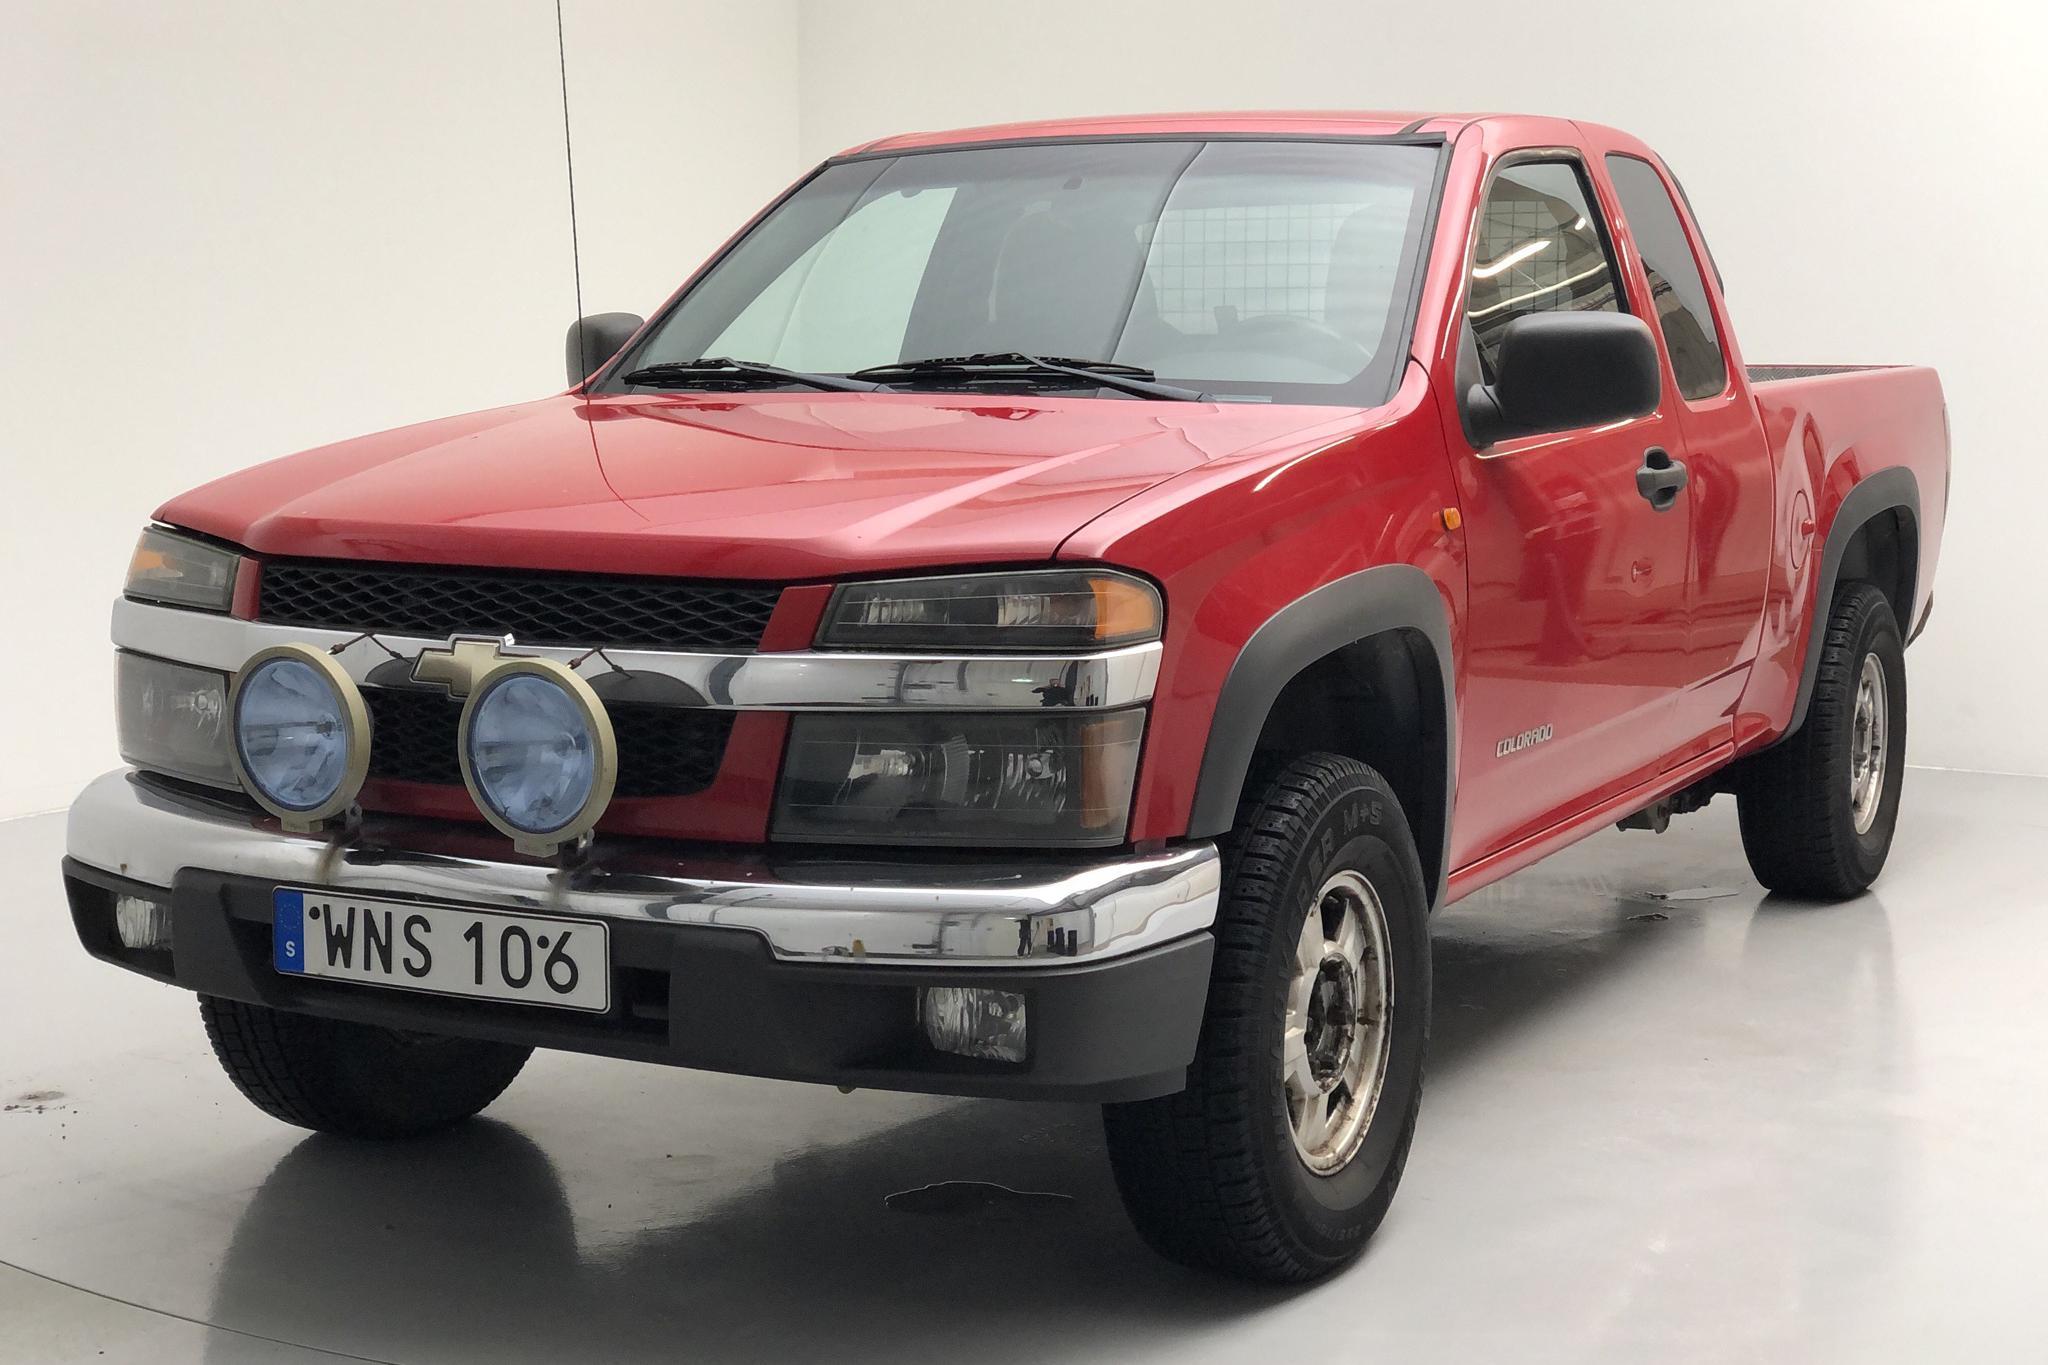 Chevrolet Colorado 3.5 4WD (220hk) - 8 672 mil - Automat - röd - 2005